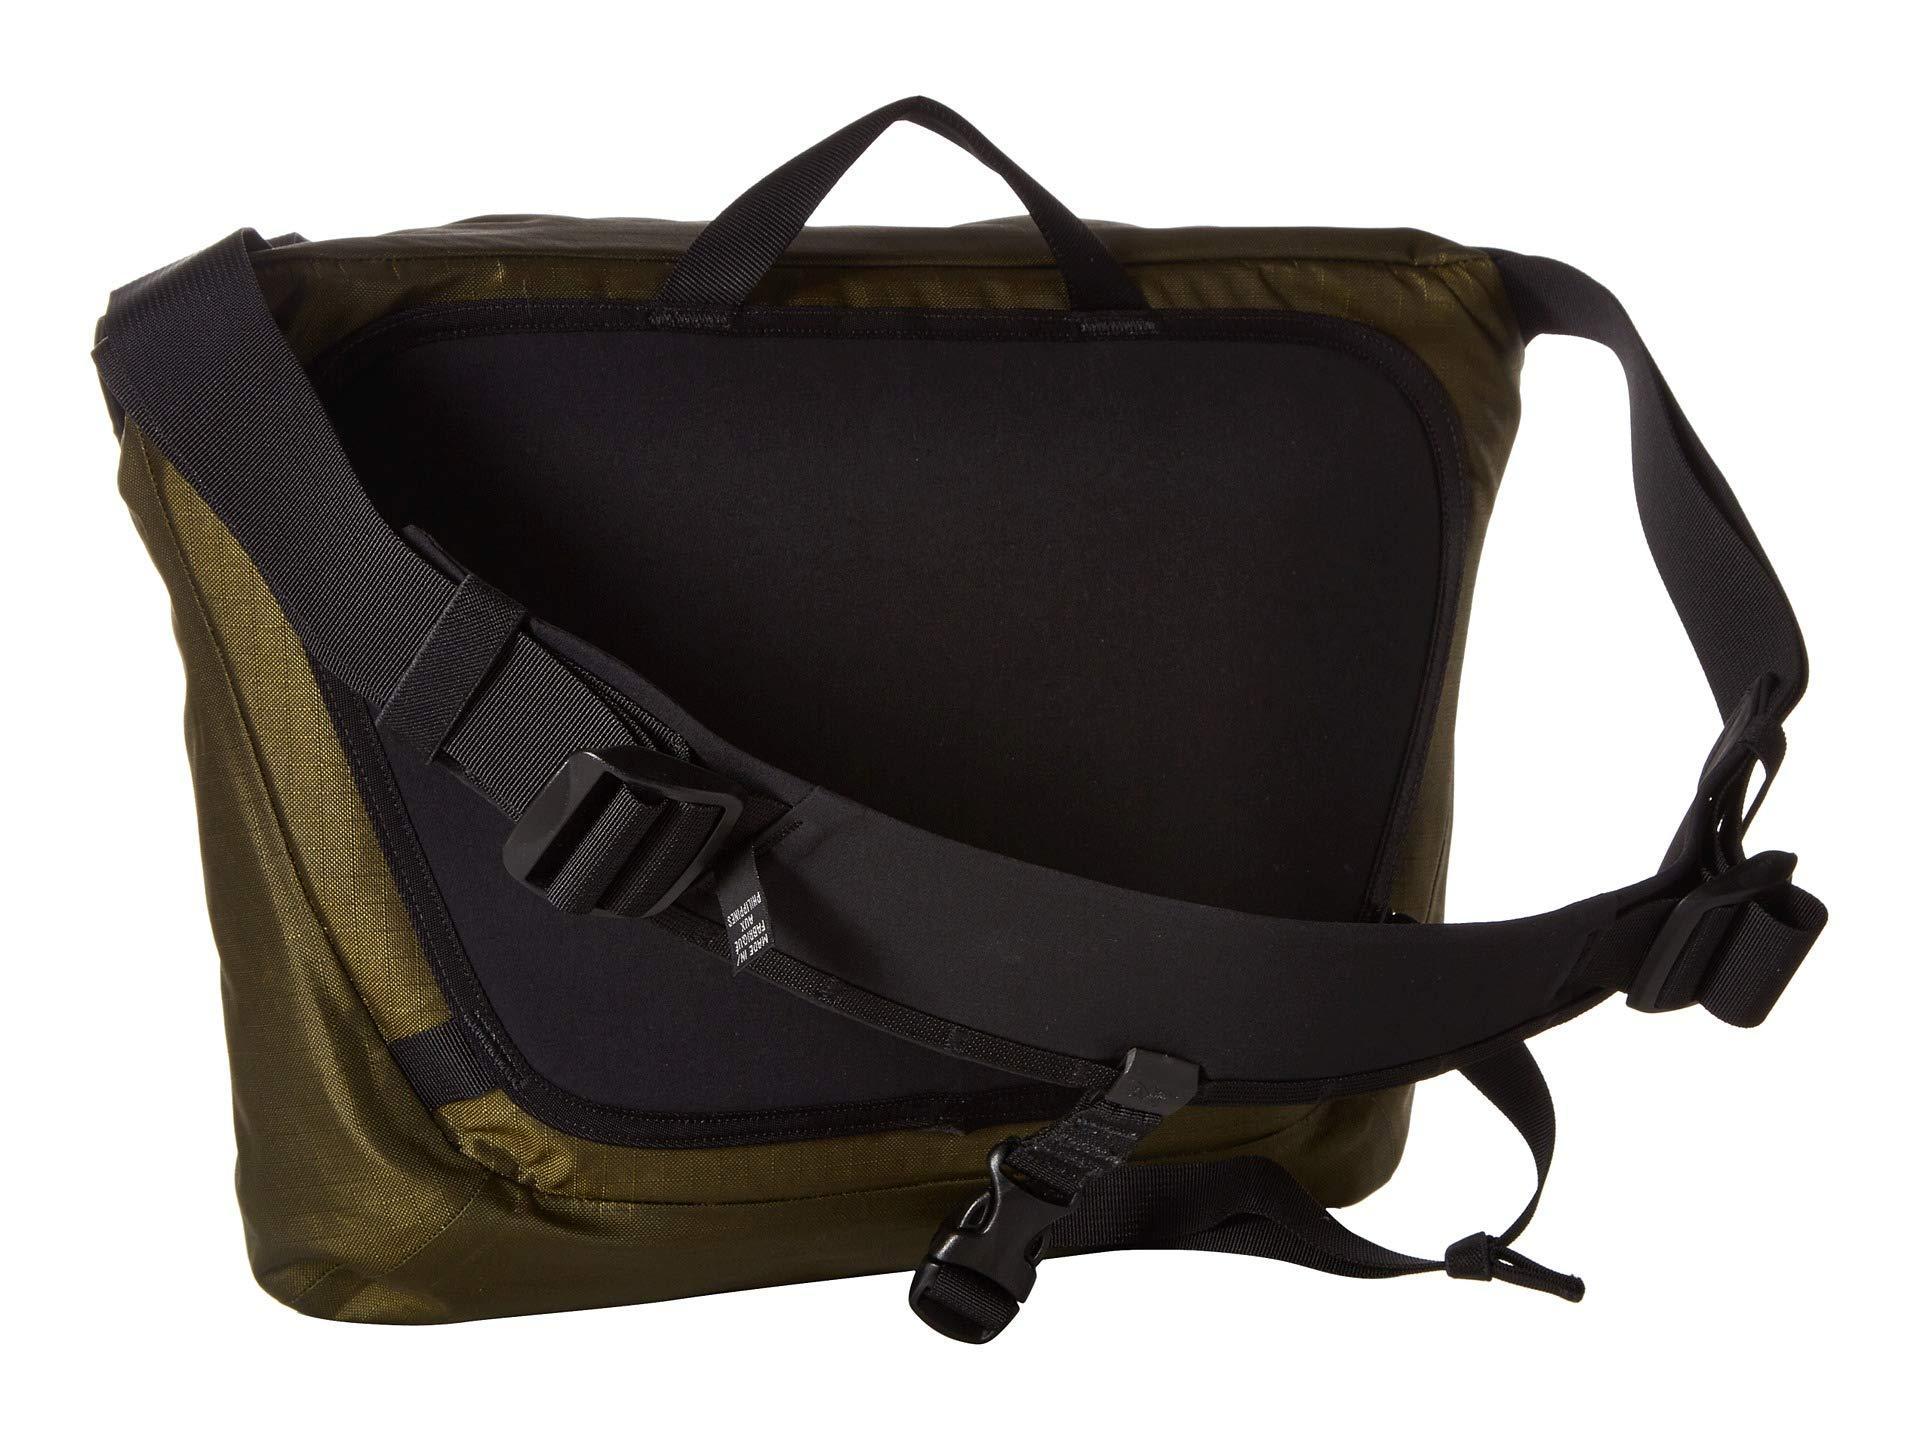 f3ae2a9e92c Lyst - Arc teryx Granville 10 Courier Bag (black) Bags in Black for Men